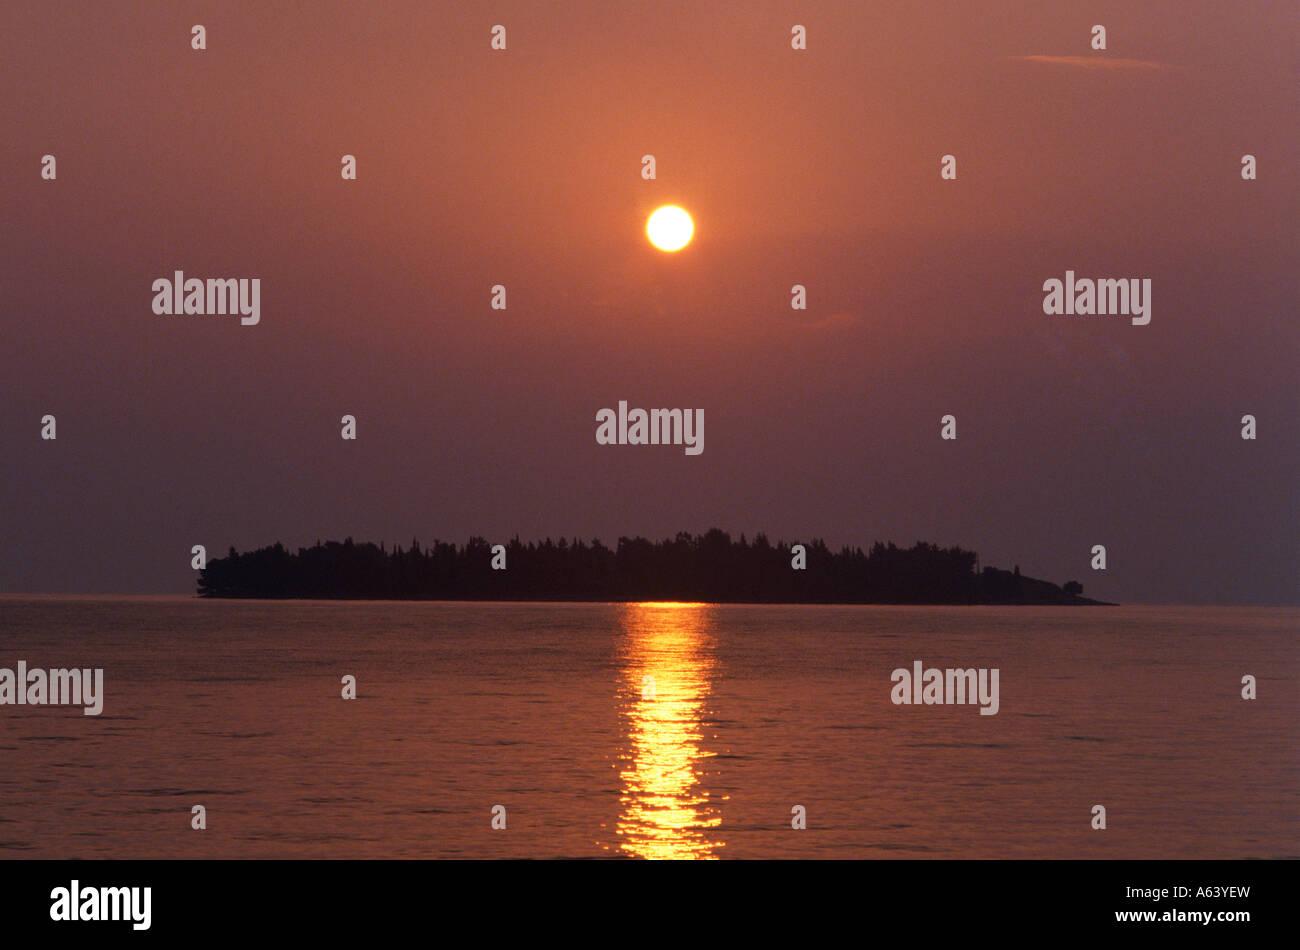 islet at sunset near island of corfu ionian islands greece - Stock Image